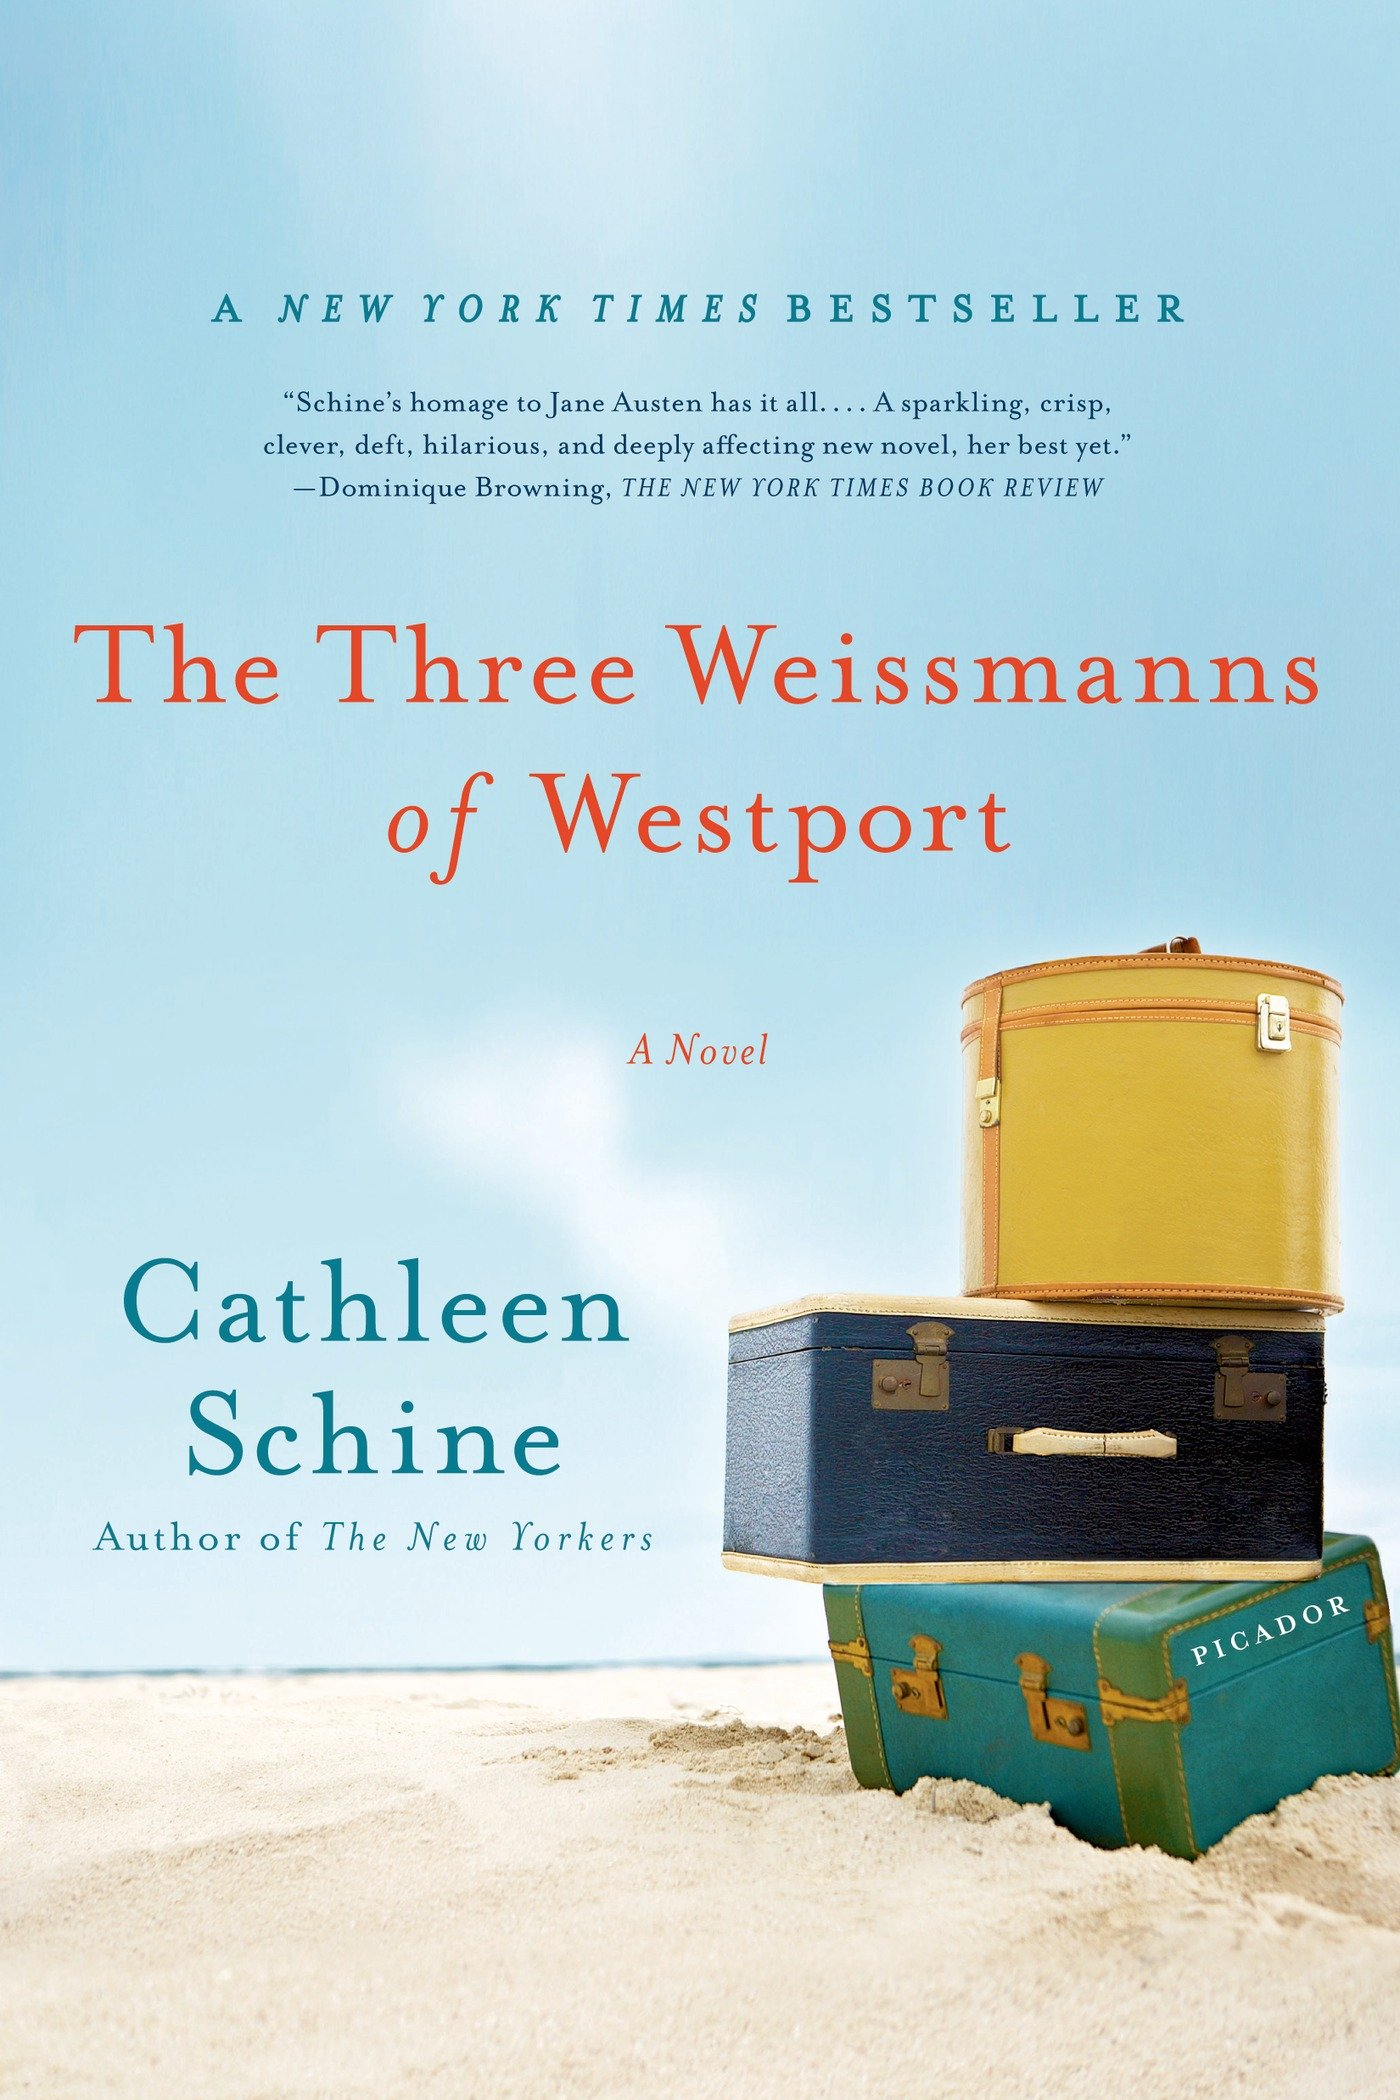 The Three Weissmanns of Westport: A Novel: Cathleen Schine ...